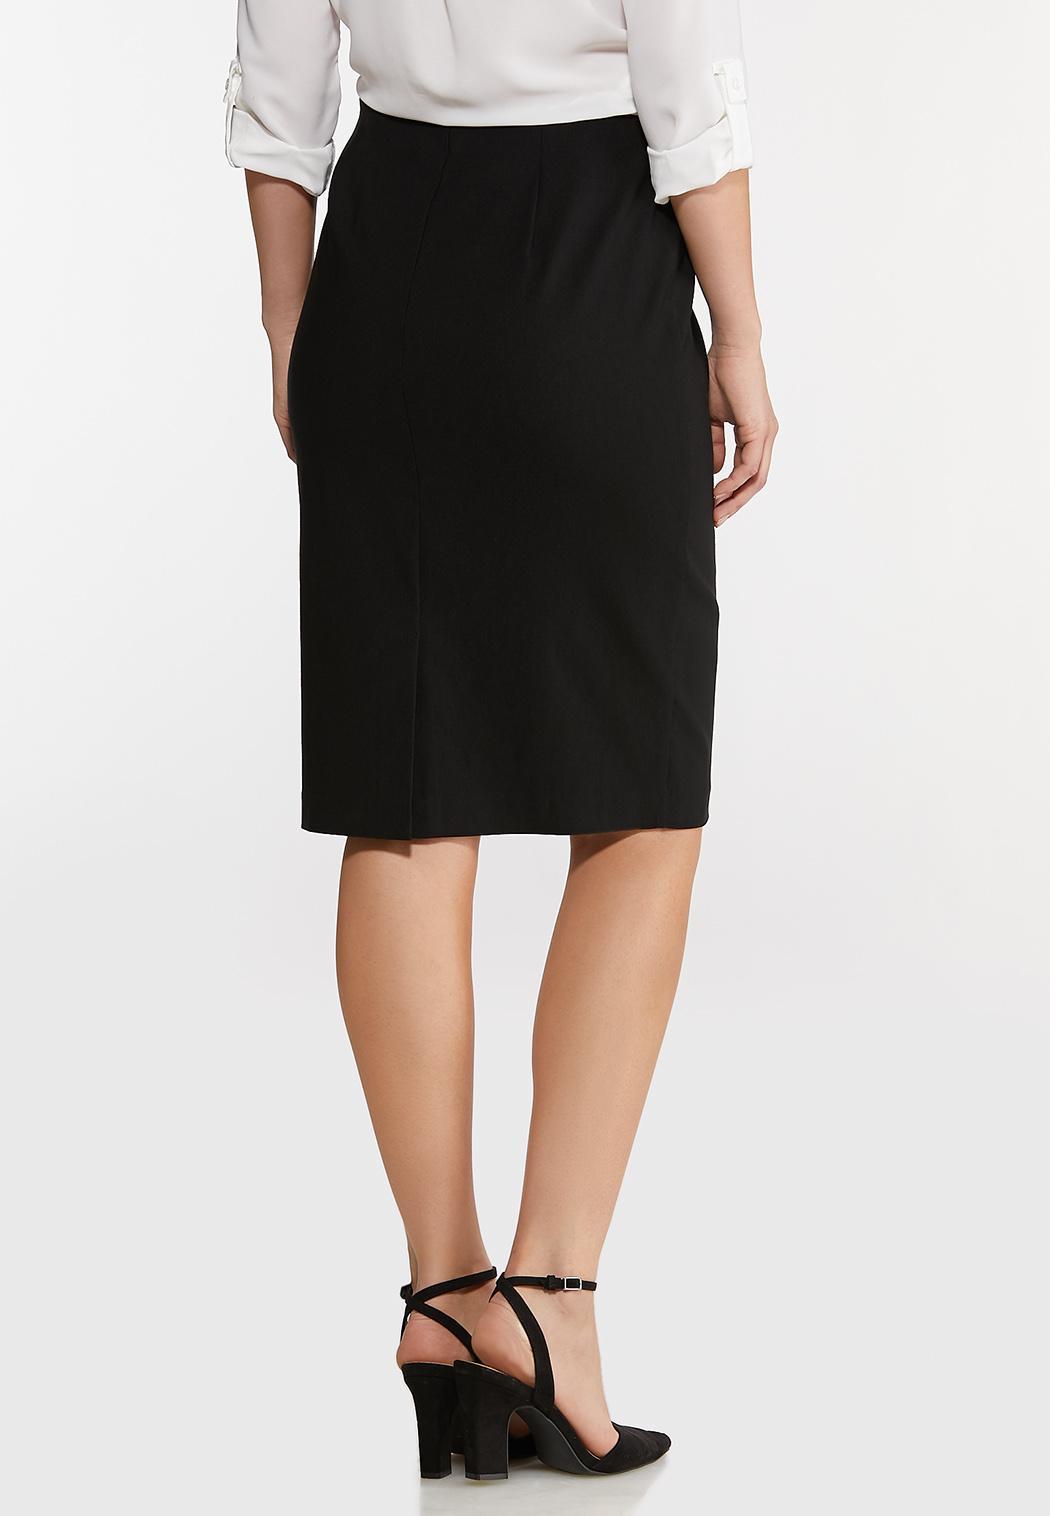 Plus Size Black Bengaline Pencil Skirt (Item #44116304)